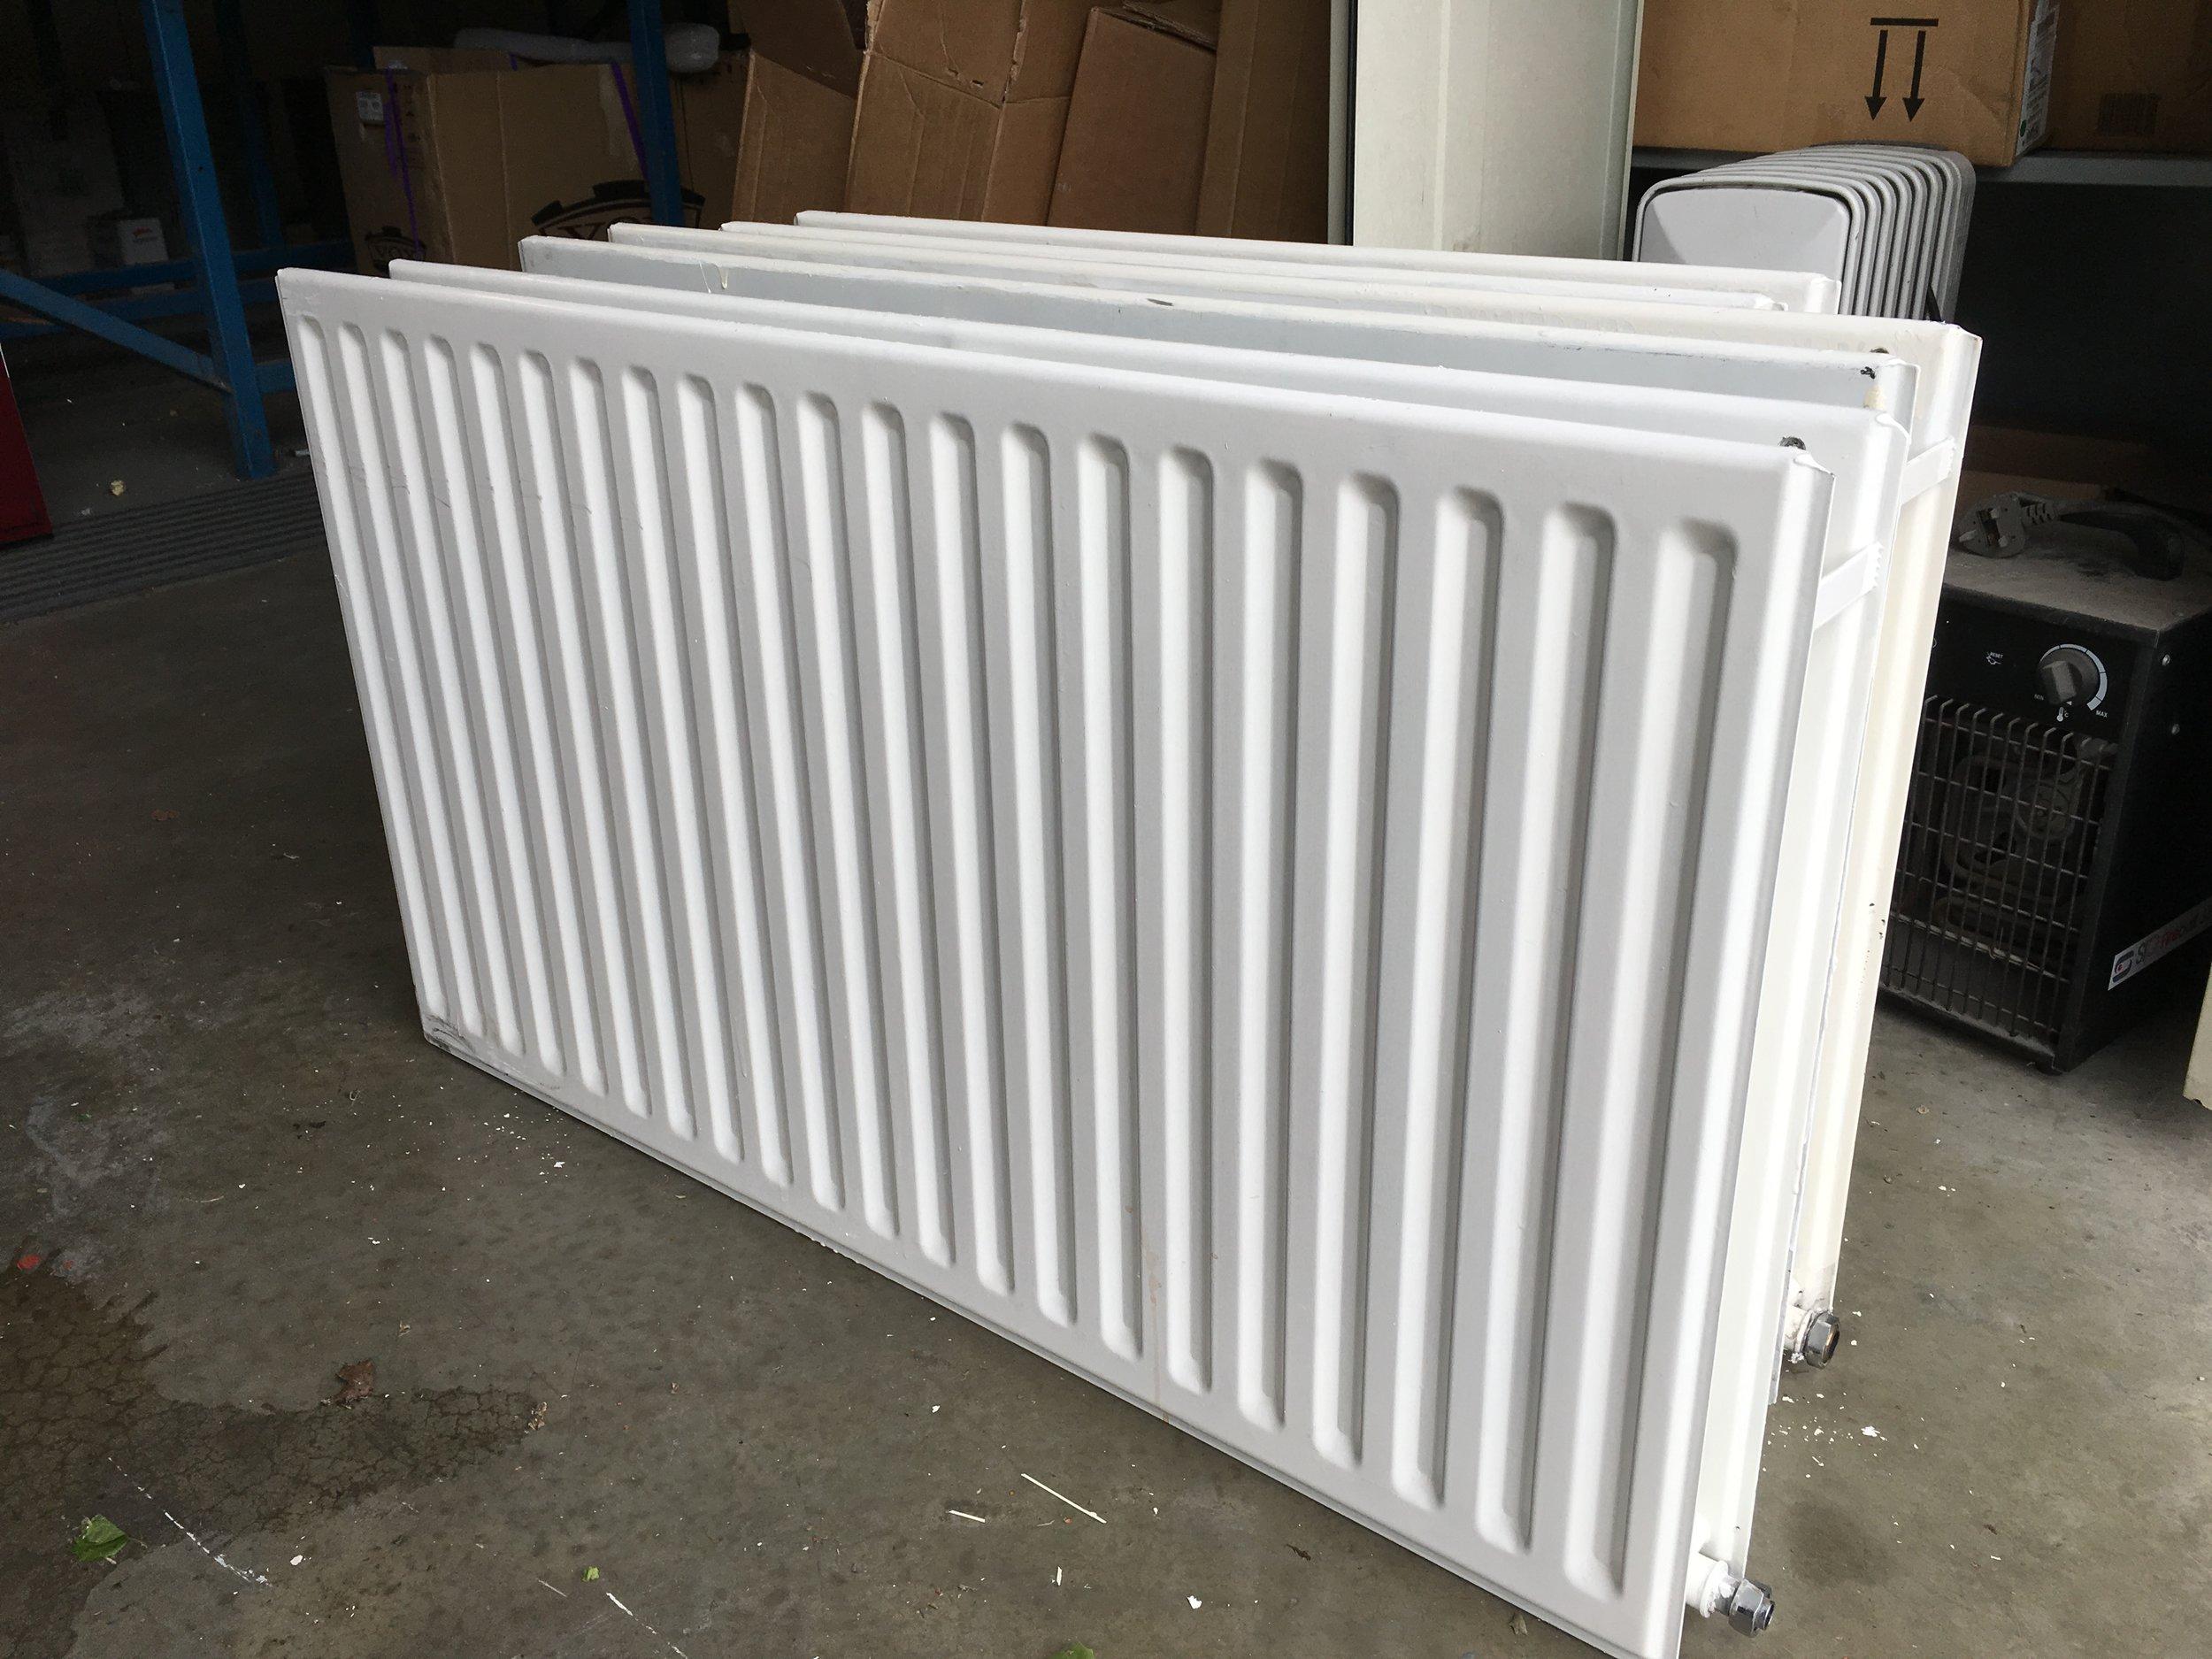 Saved a fortune refurbishing these radiators